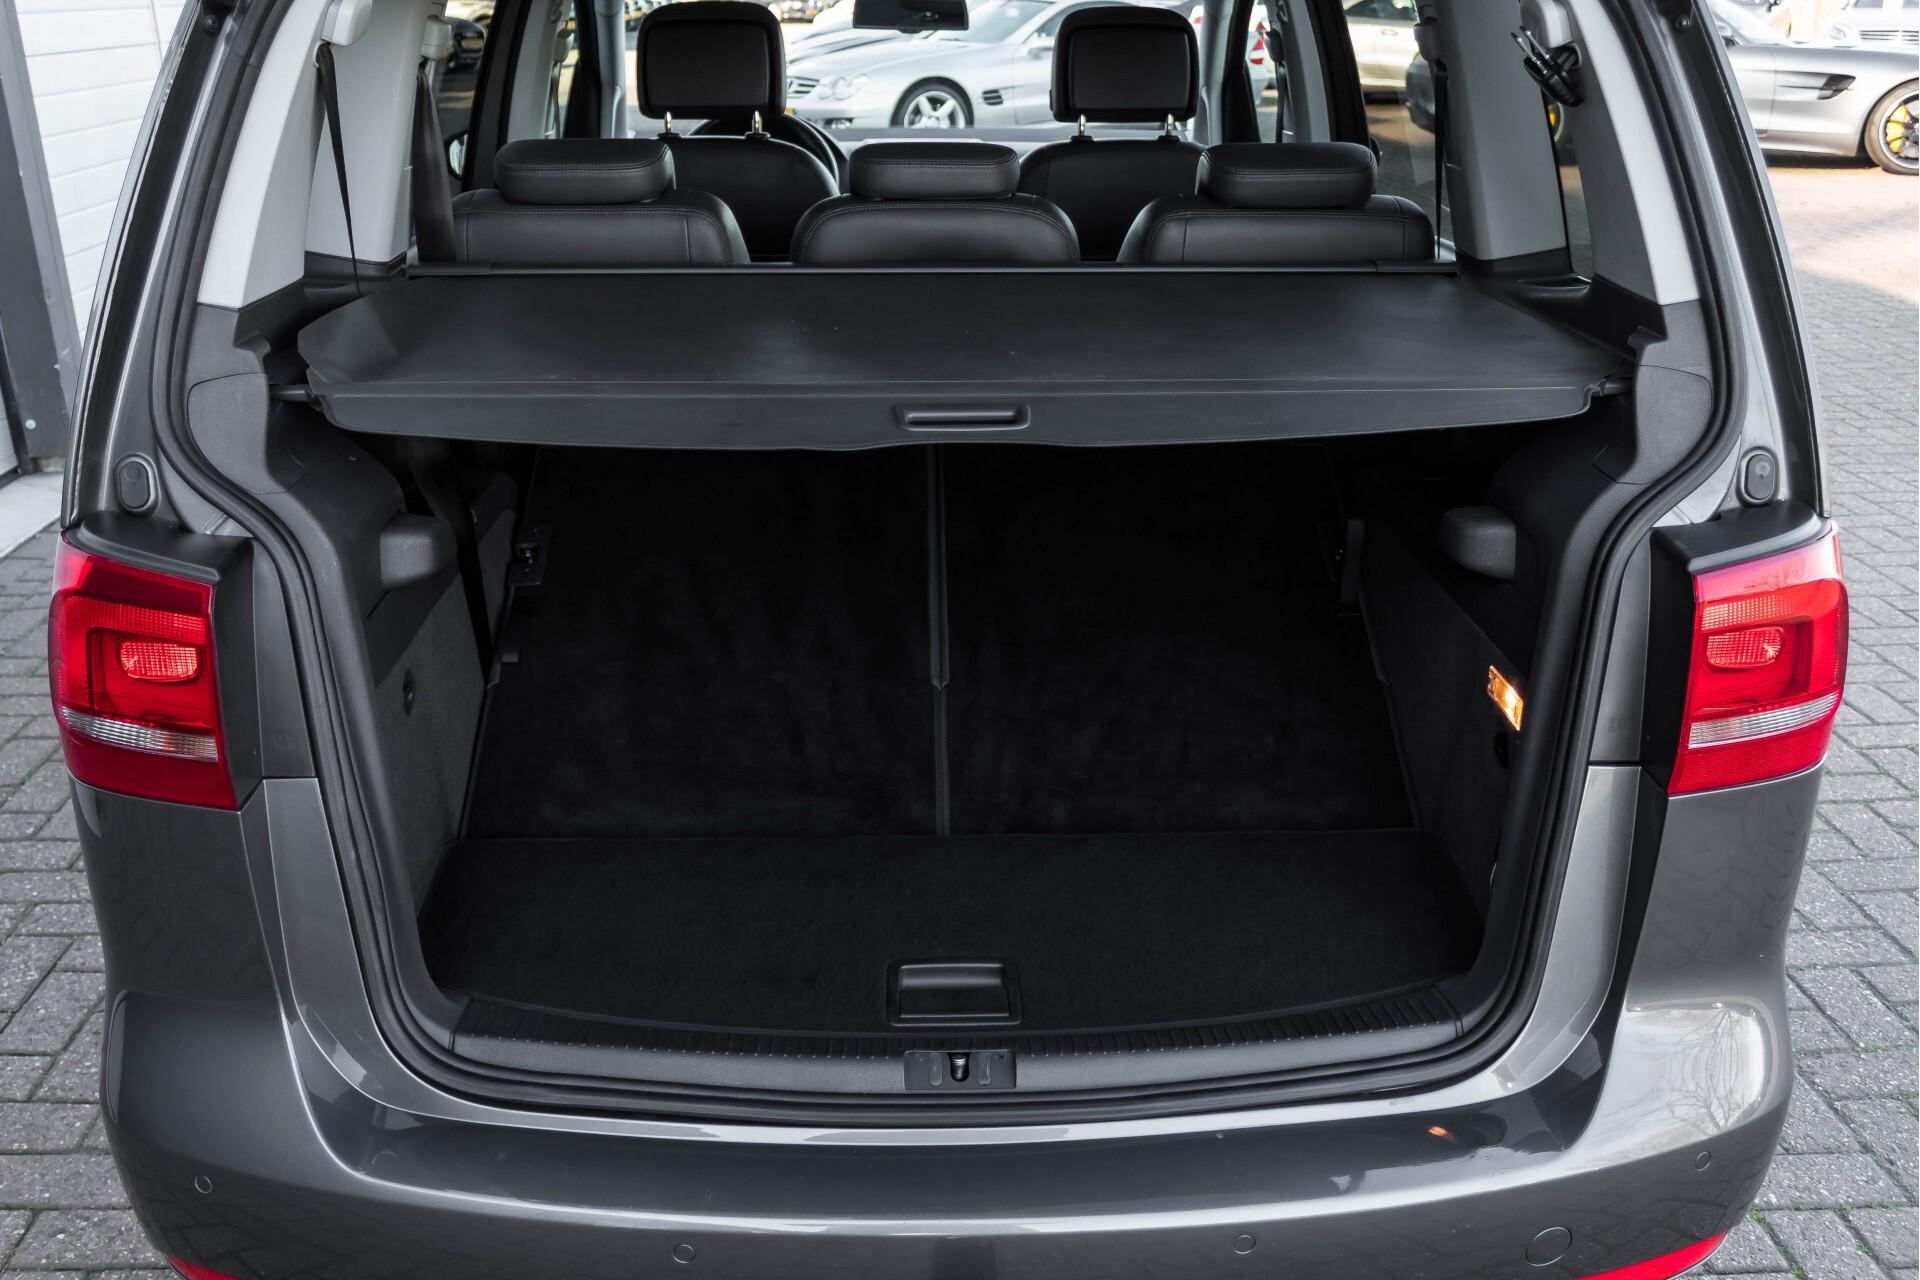 Volkswagen Touran 2.0 TDI Highline 7Persoons 177pk Panorama/Leder/Navi/Camera/Verw-Stln/Trhk/ECC/Xenon Aut Foto 41